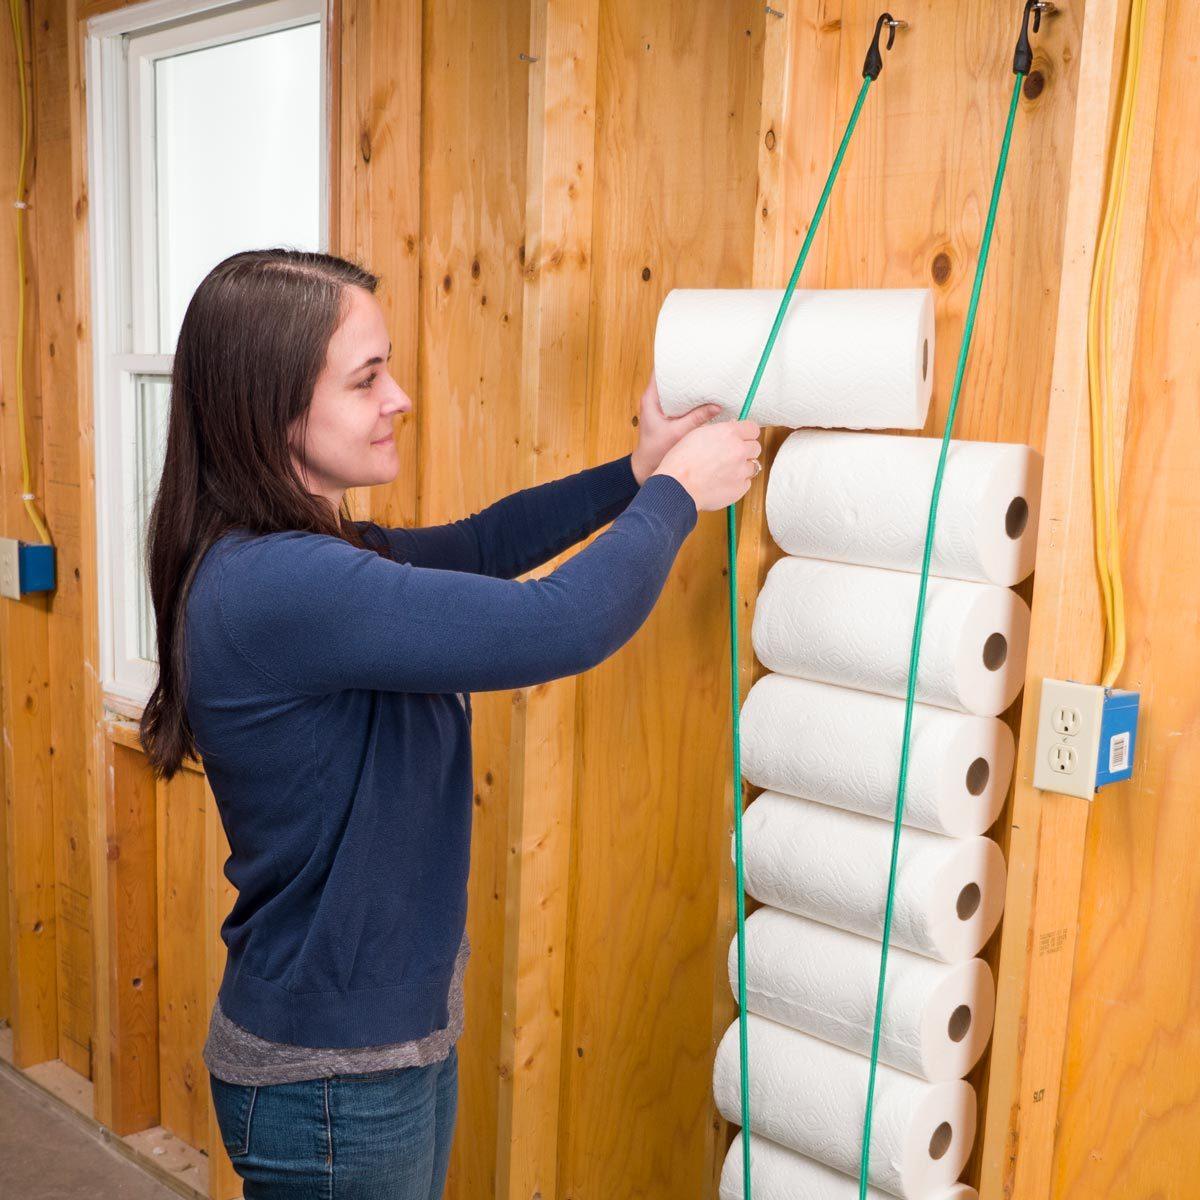 Bungee Cord Paper Towel Storage